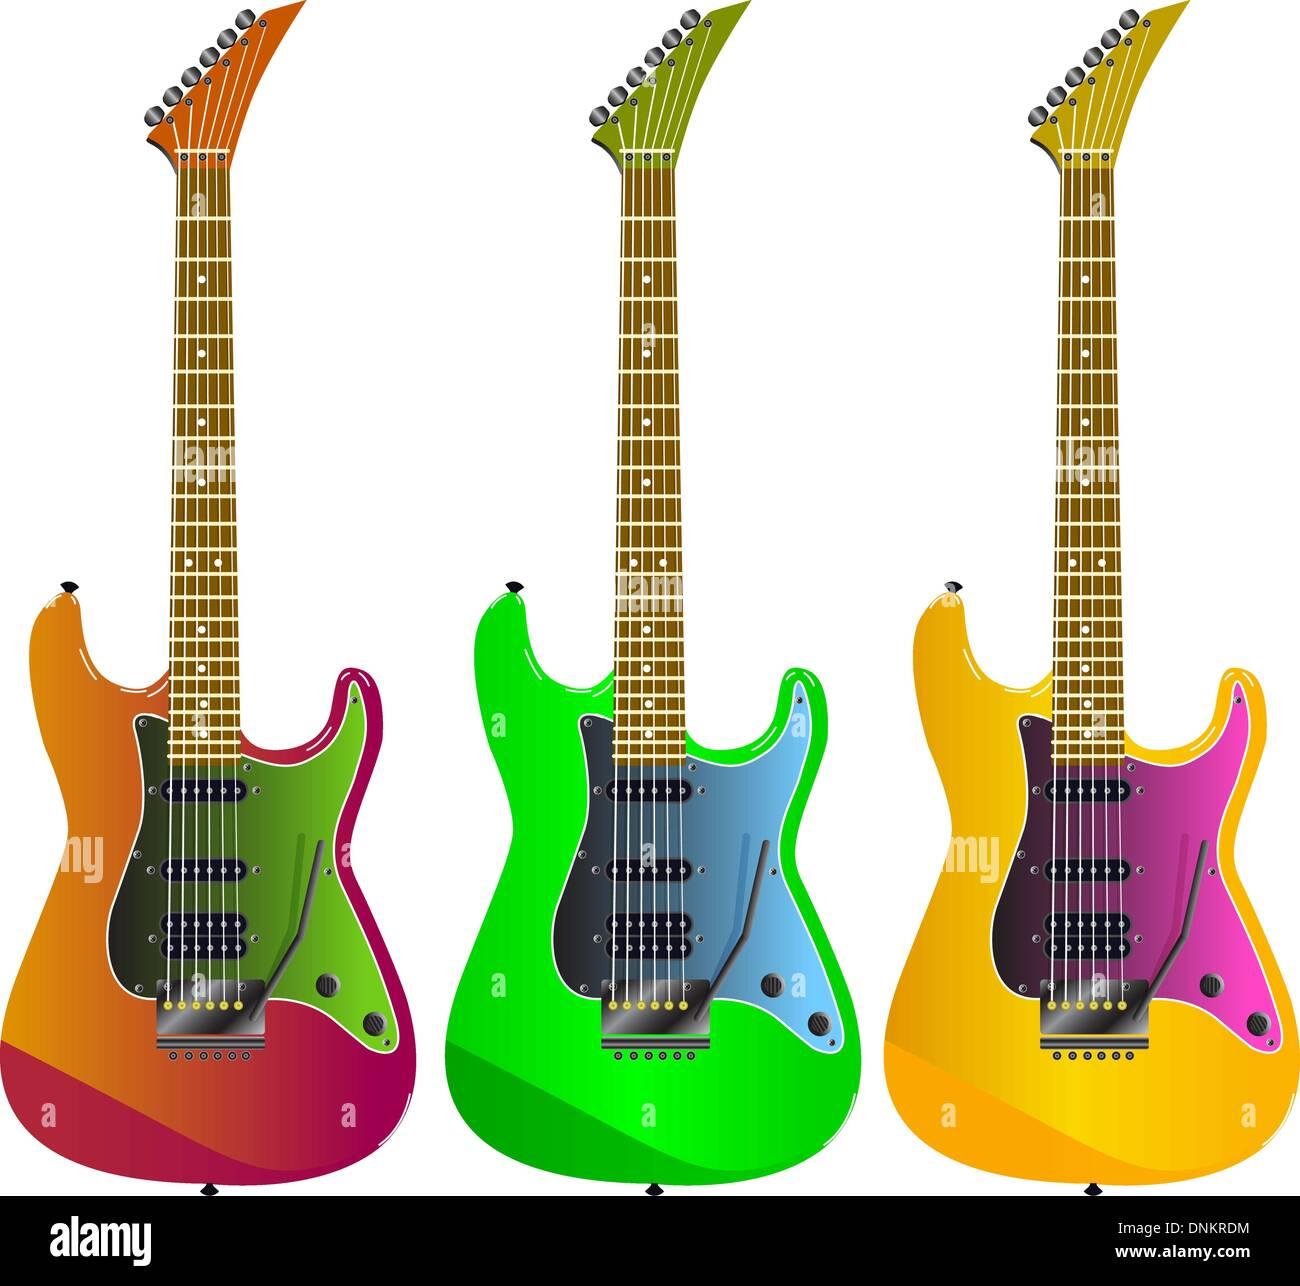 Guitarra eléctrica sobre un fondo blanco. Imagen De Stock